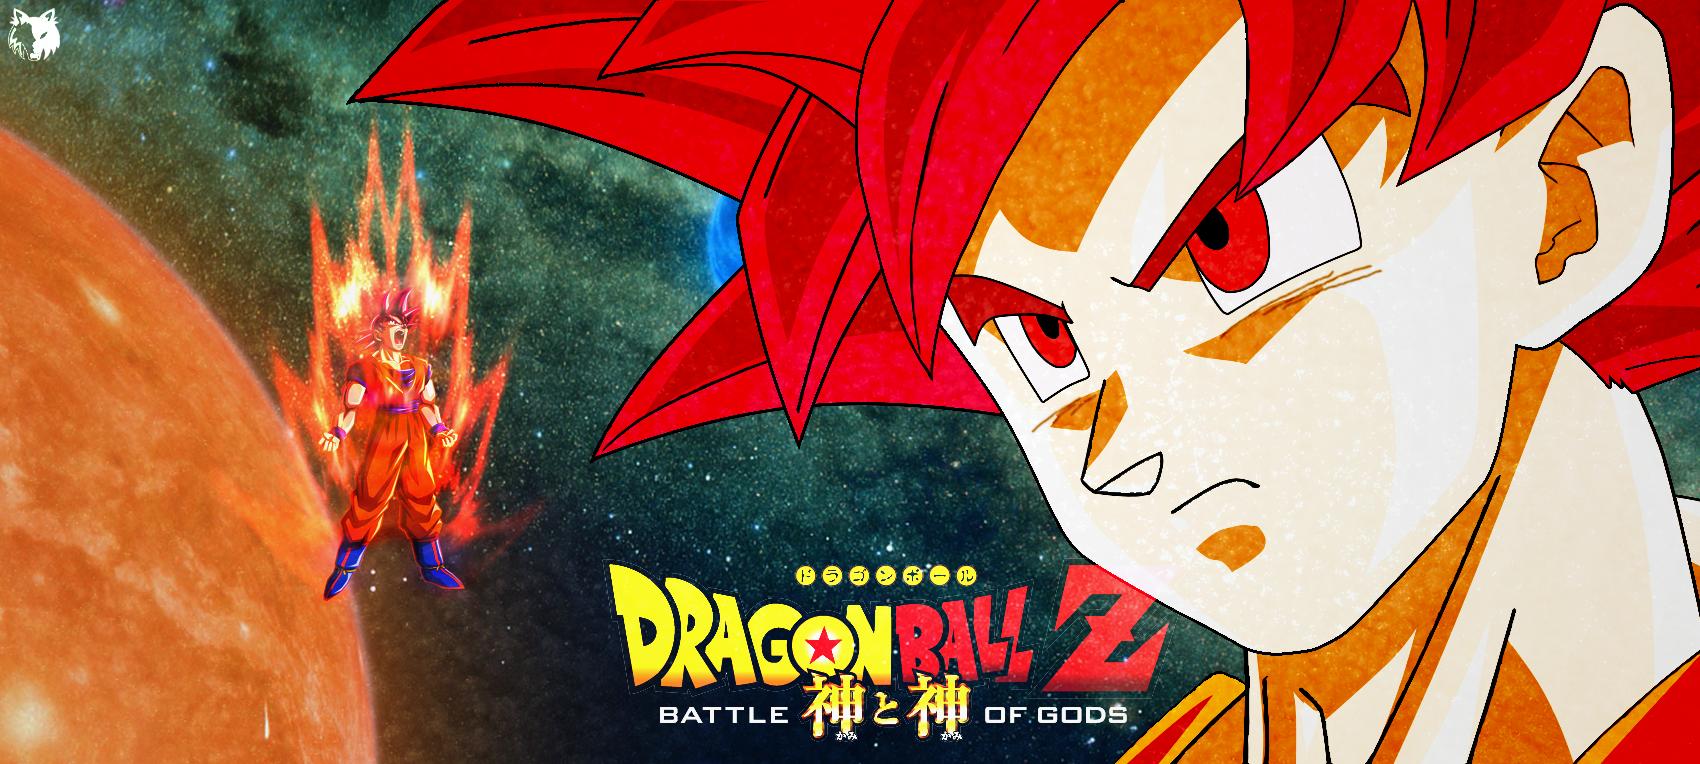 Goku Super Saiyan Wallpaper - WallpaperSafari